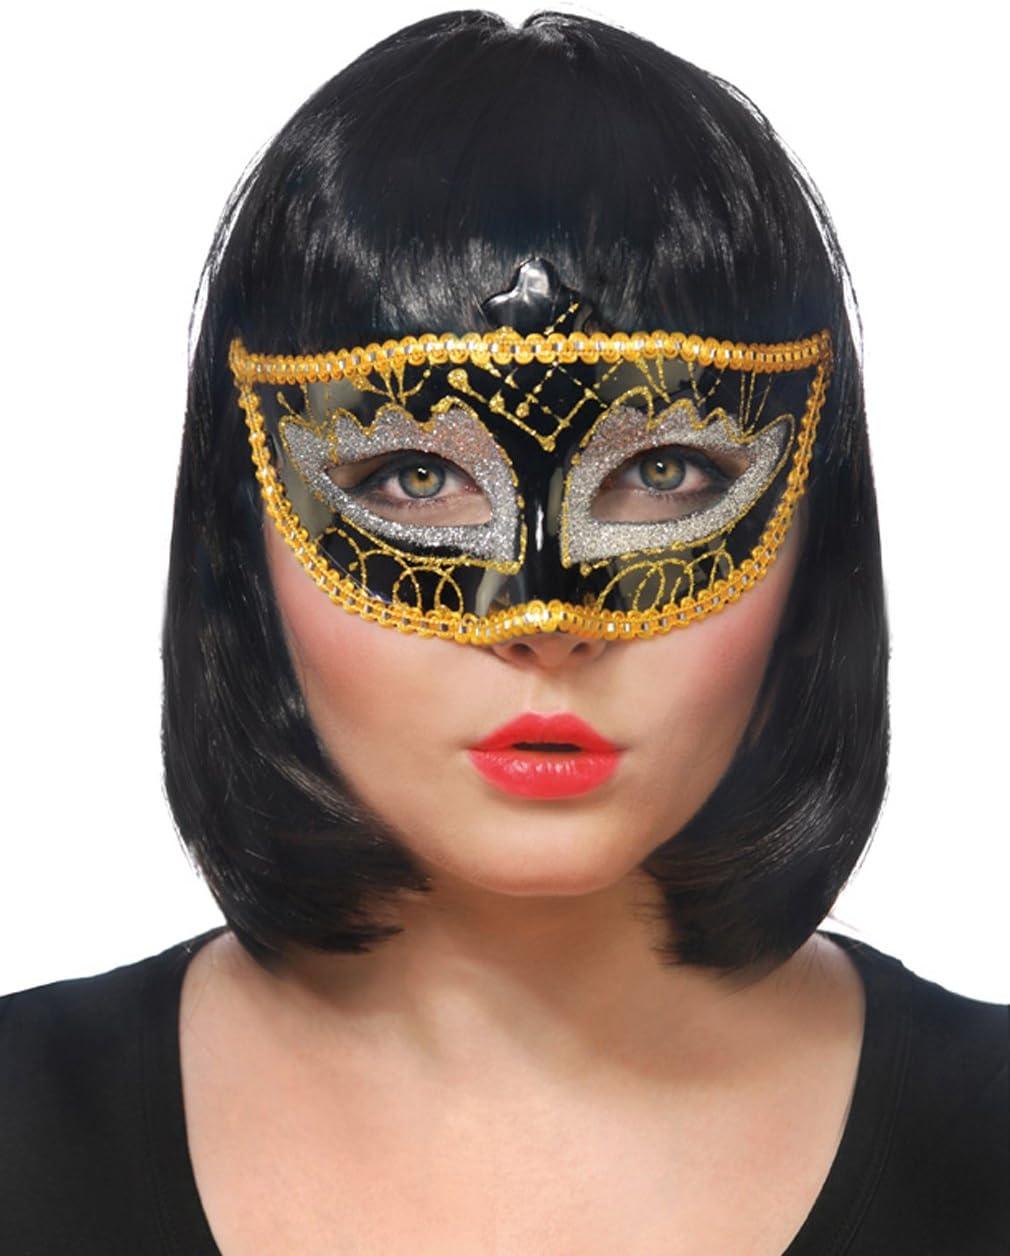 Maschera VENEZIANE CON GLITTER ORO ARGENTO PARTY Carnevale Ballo In Maschera Occhi Maschera